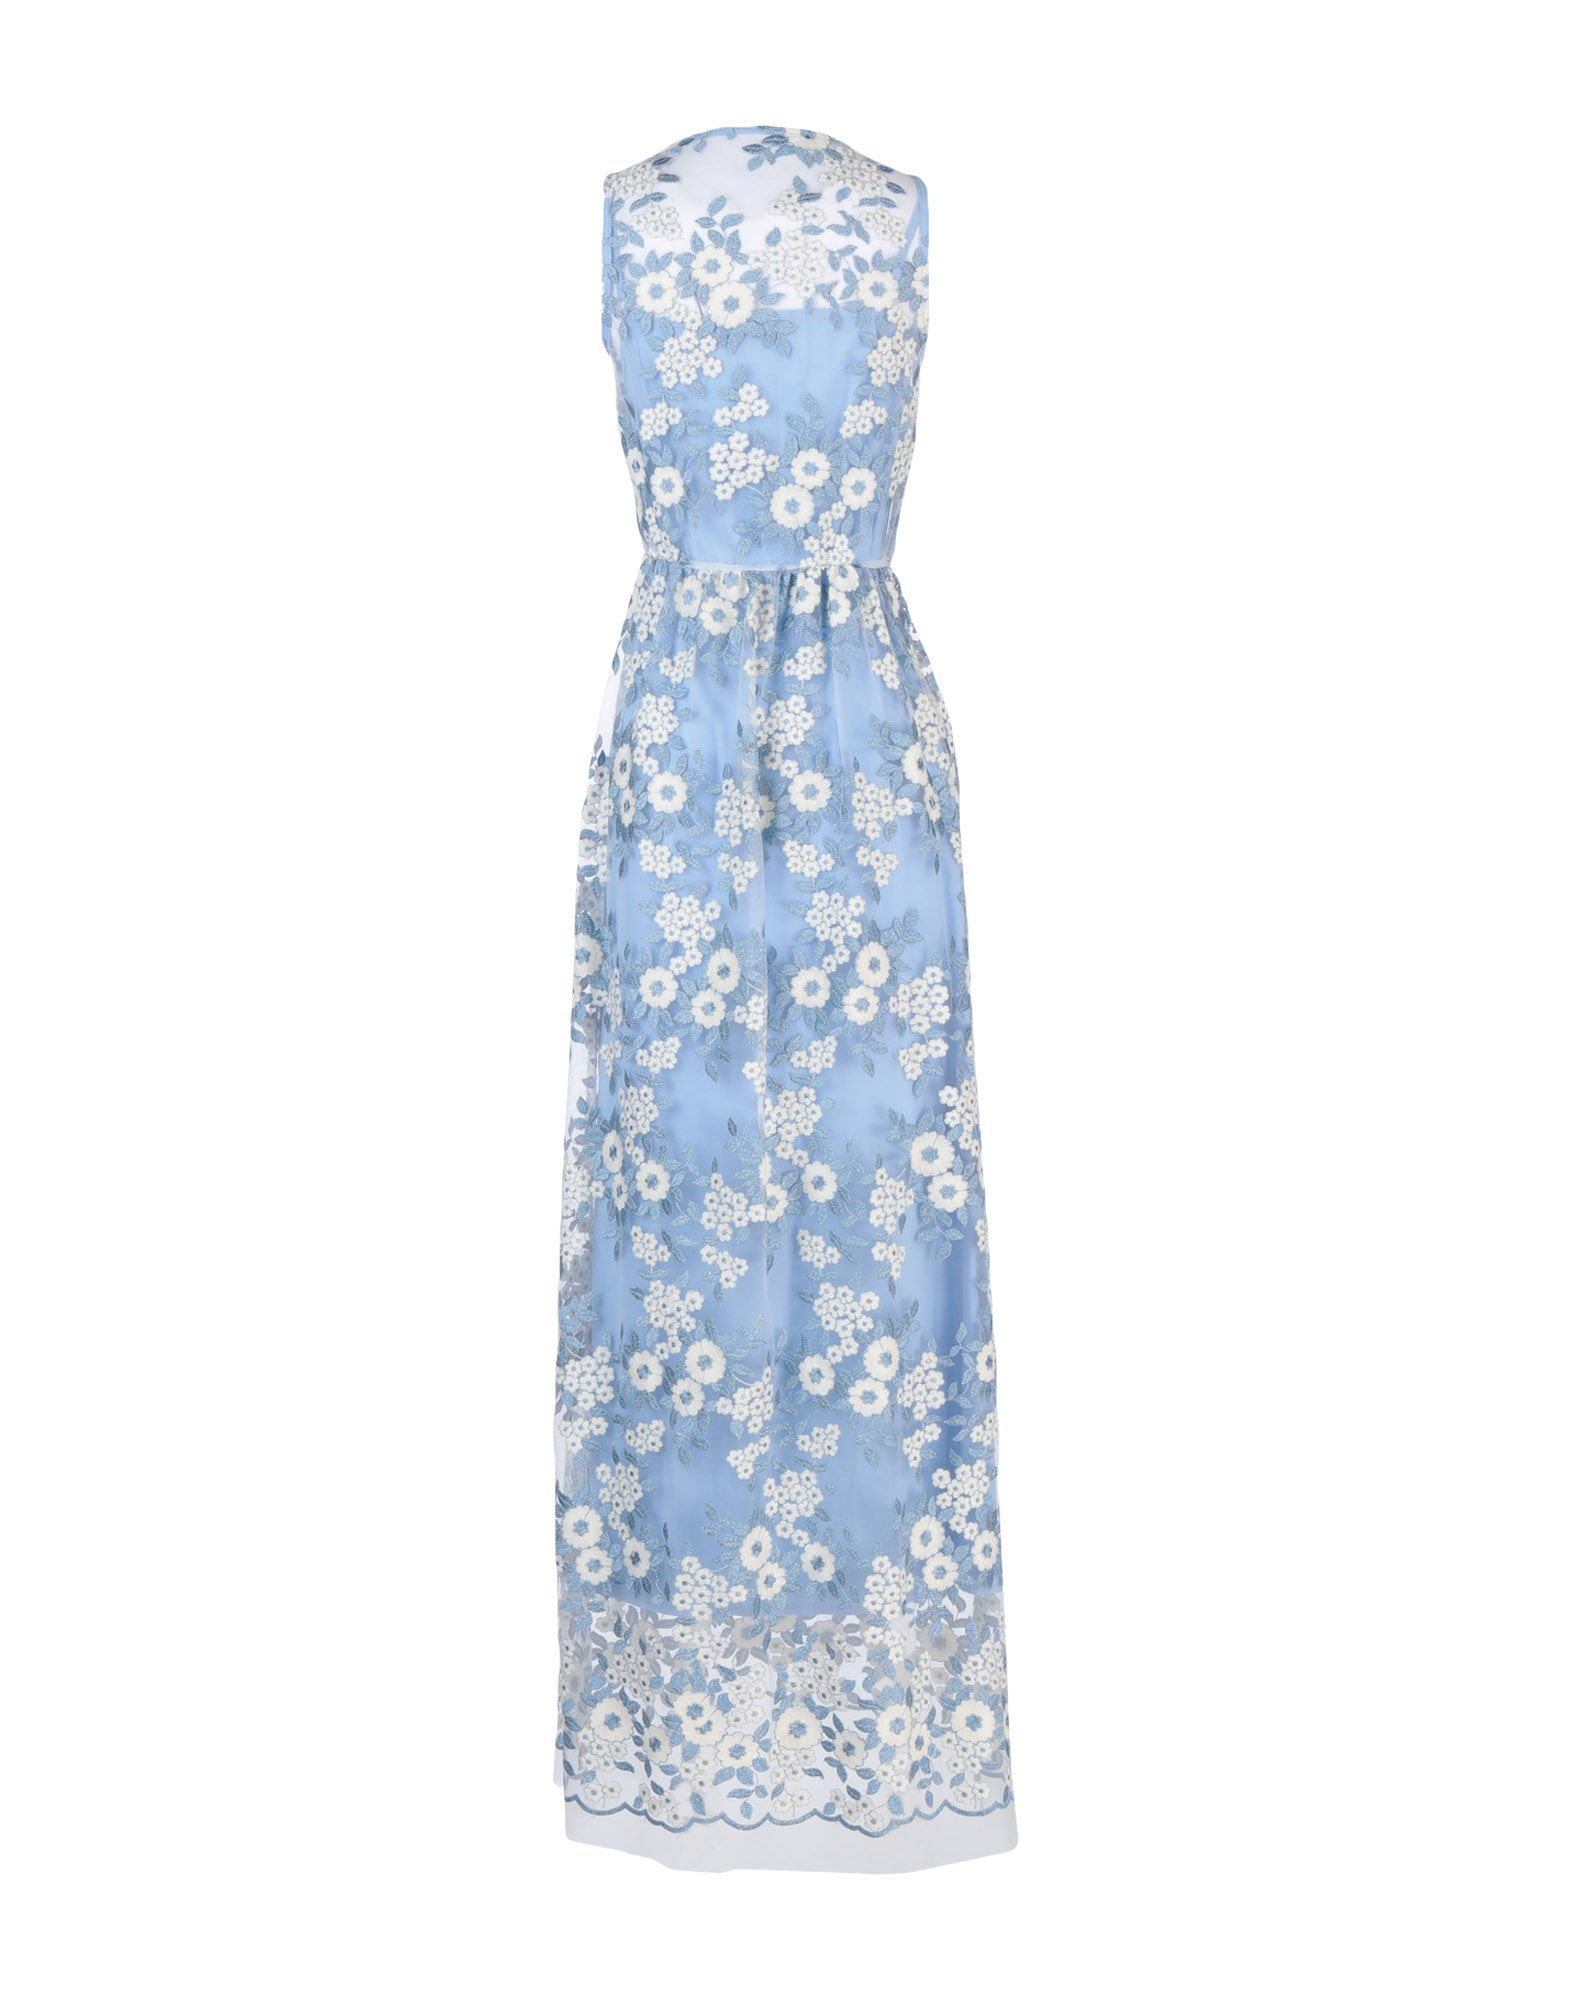 Twenty Easy By Kaos Sky Blue Floral Design Cotton Dress